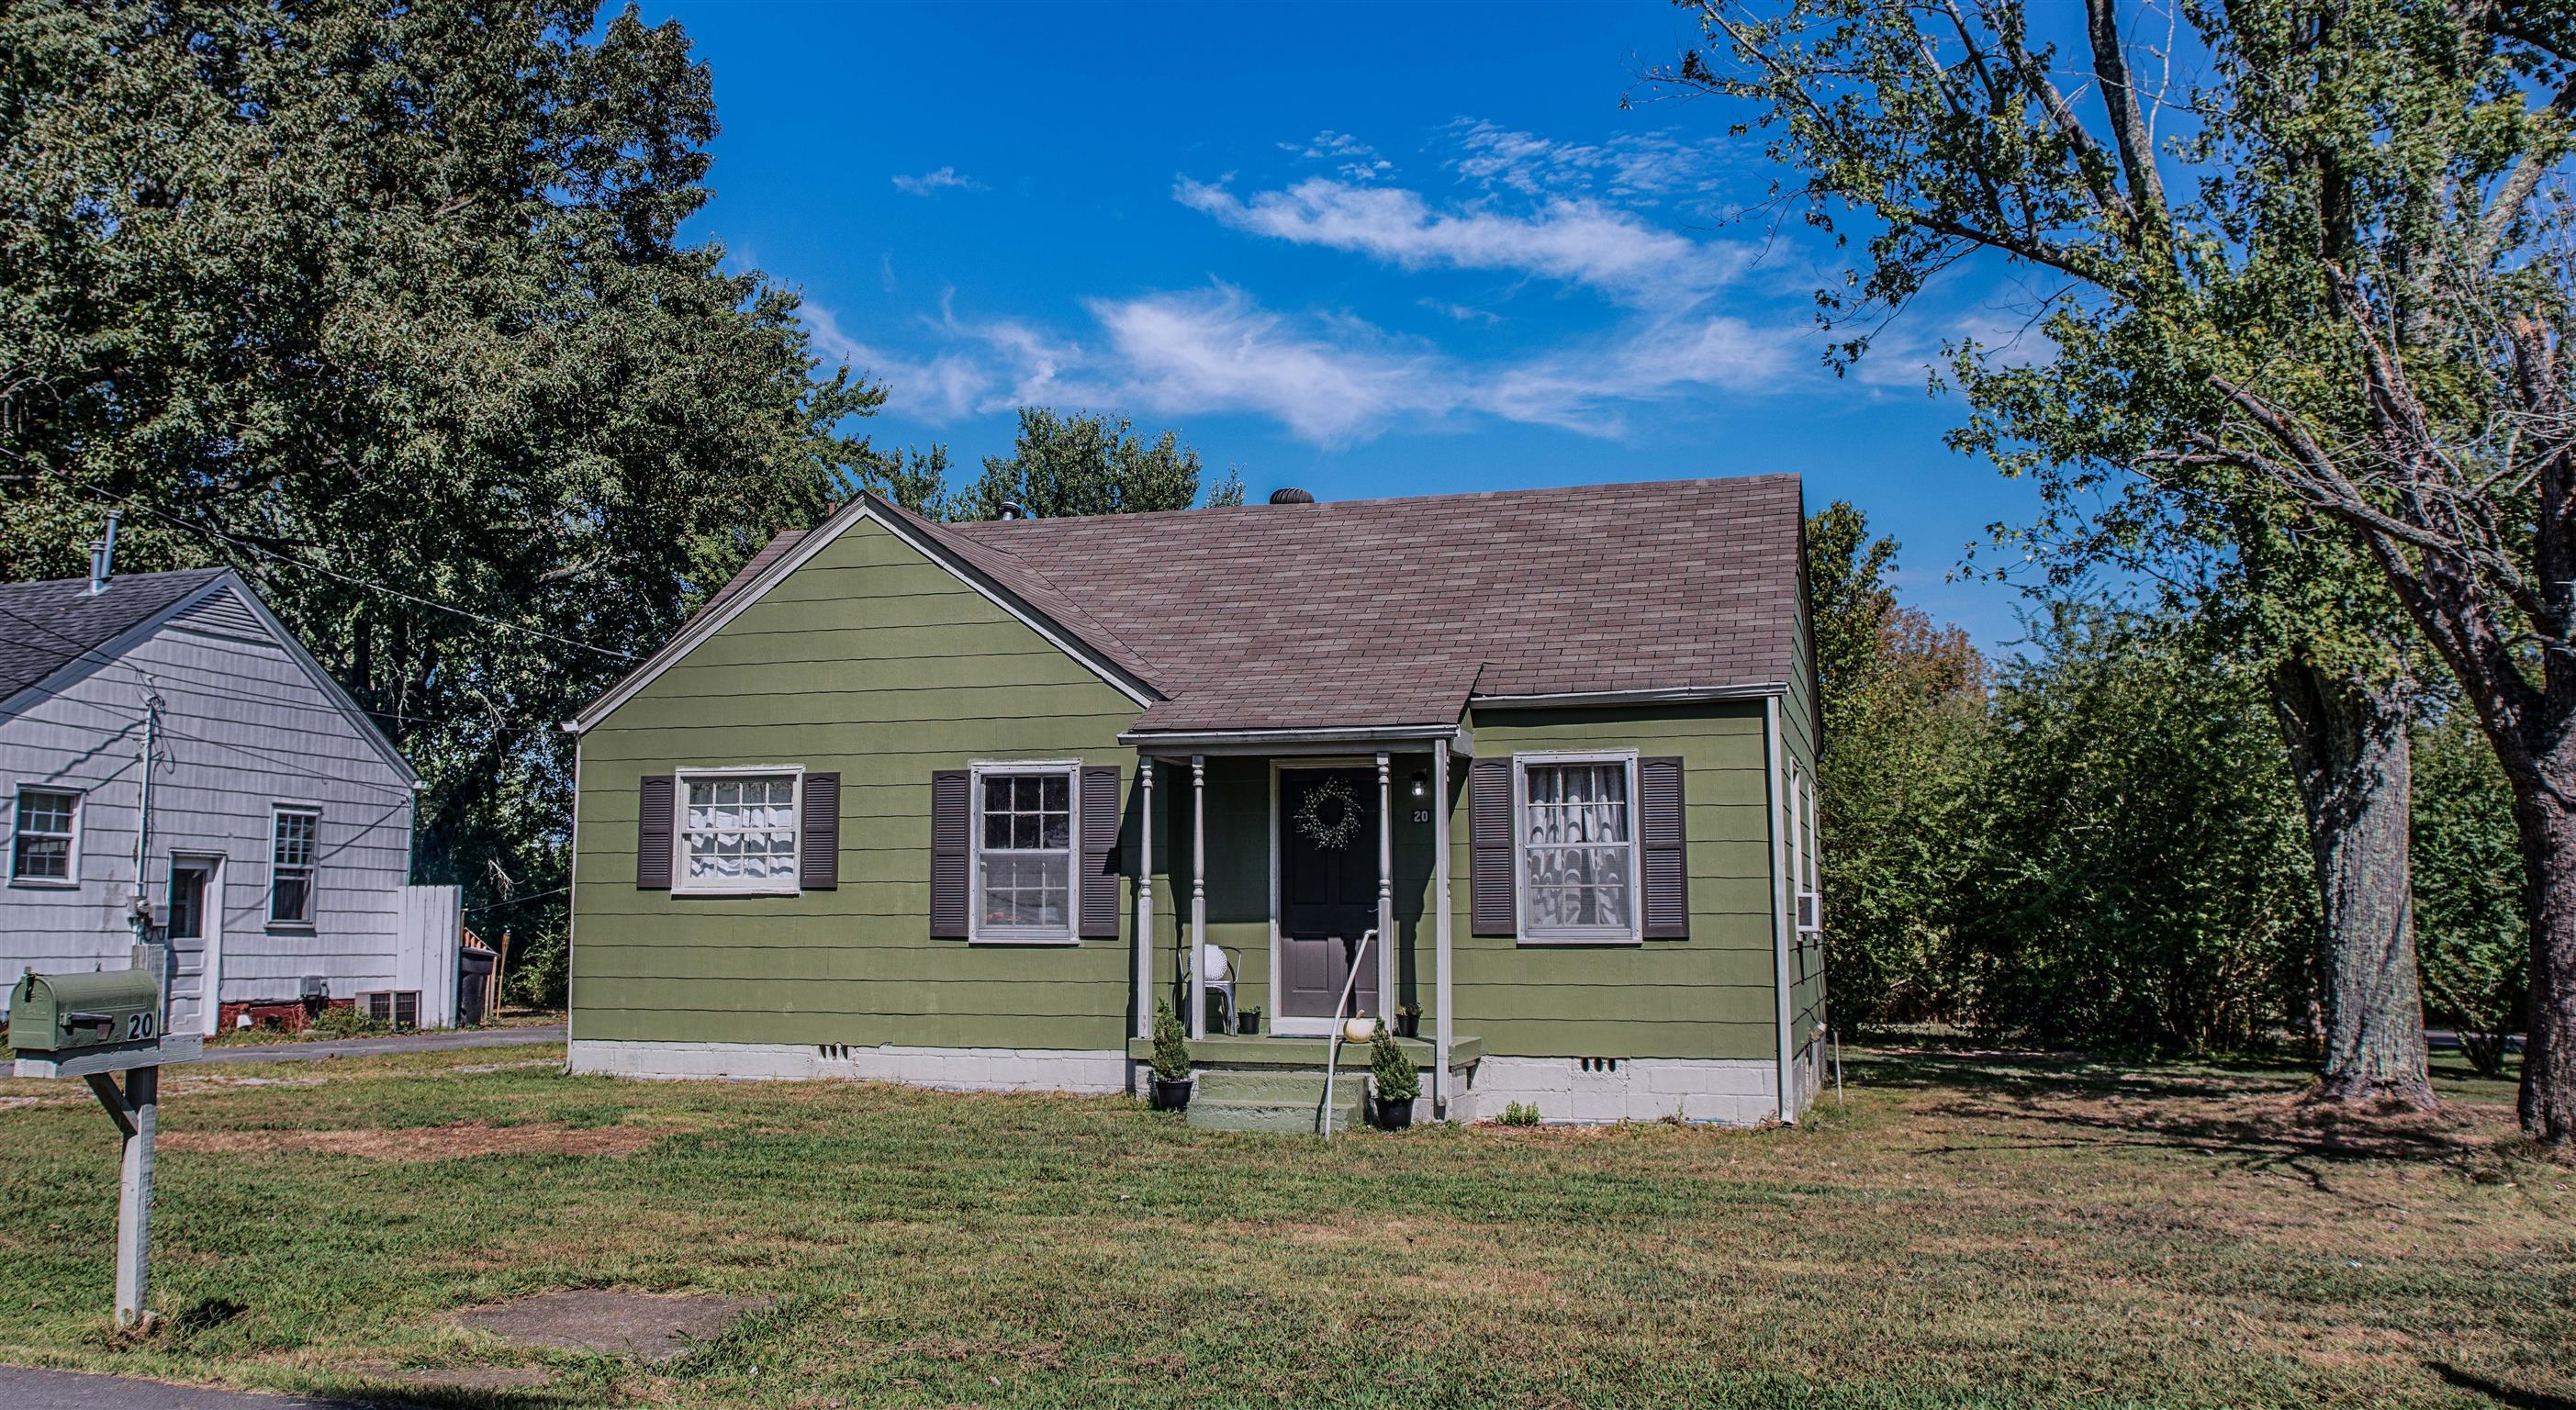 20 Central Ave, Tullahoma, TN 37388 - Tullahoma, TN real estate listing